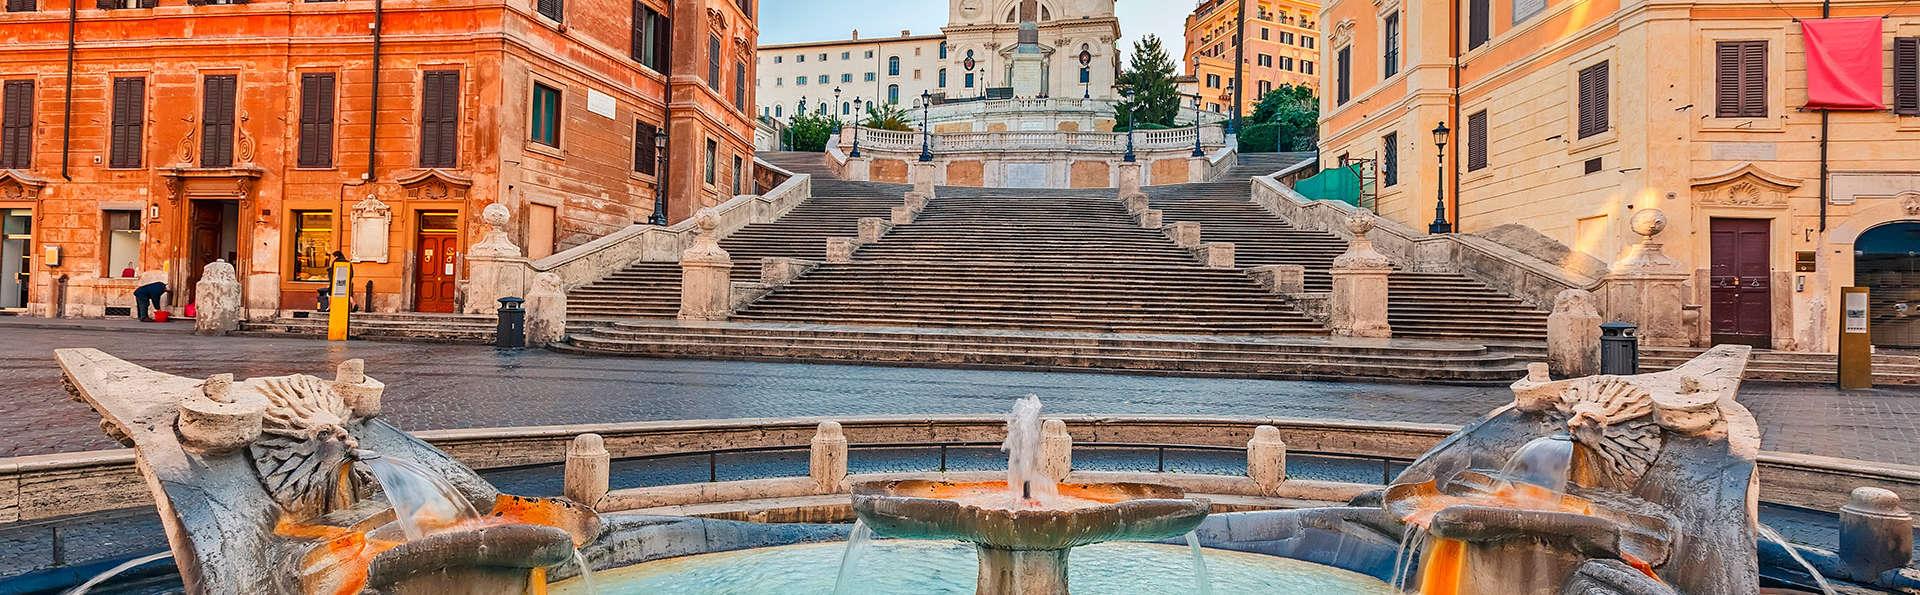 Roman Terrace - Edit_Piazza-di-Spagna.jpg